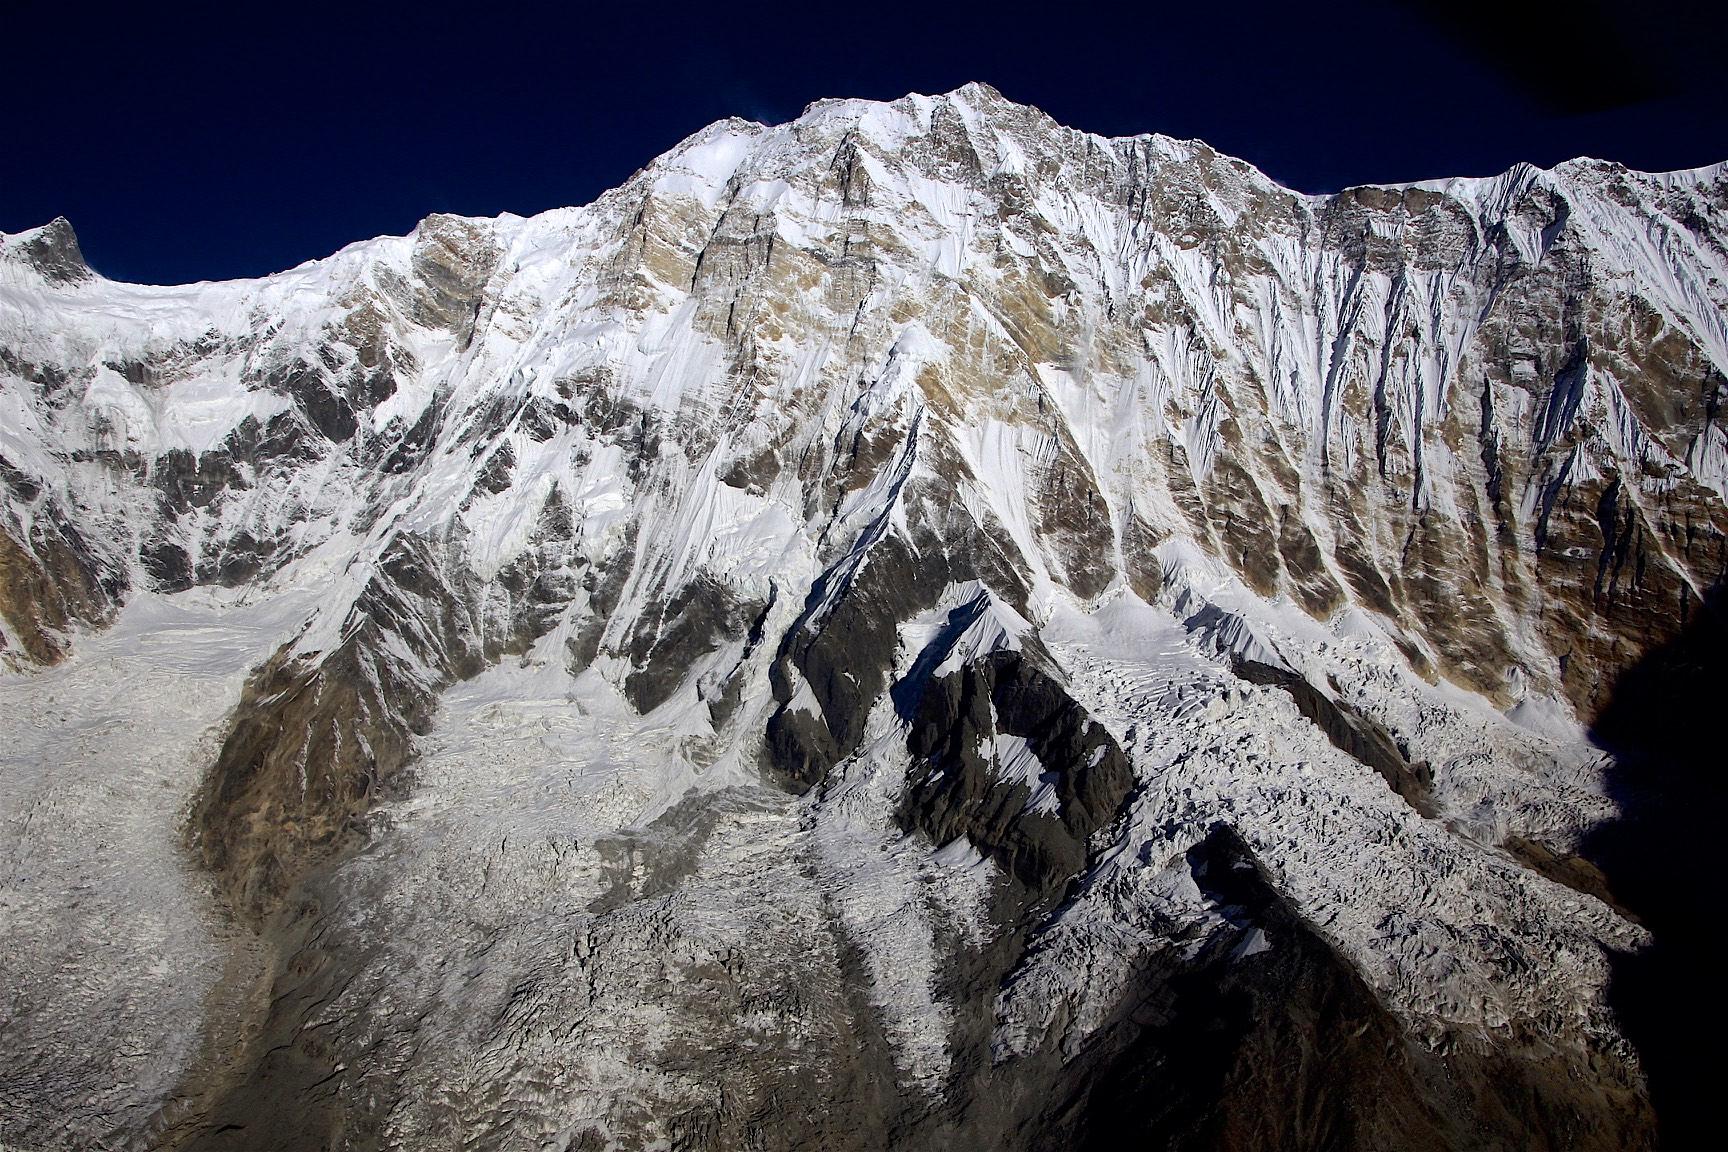 Annapurna 1